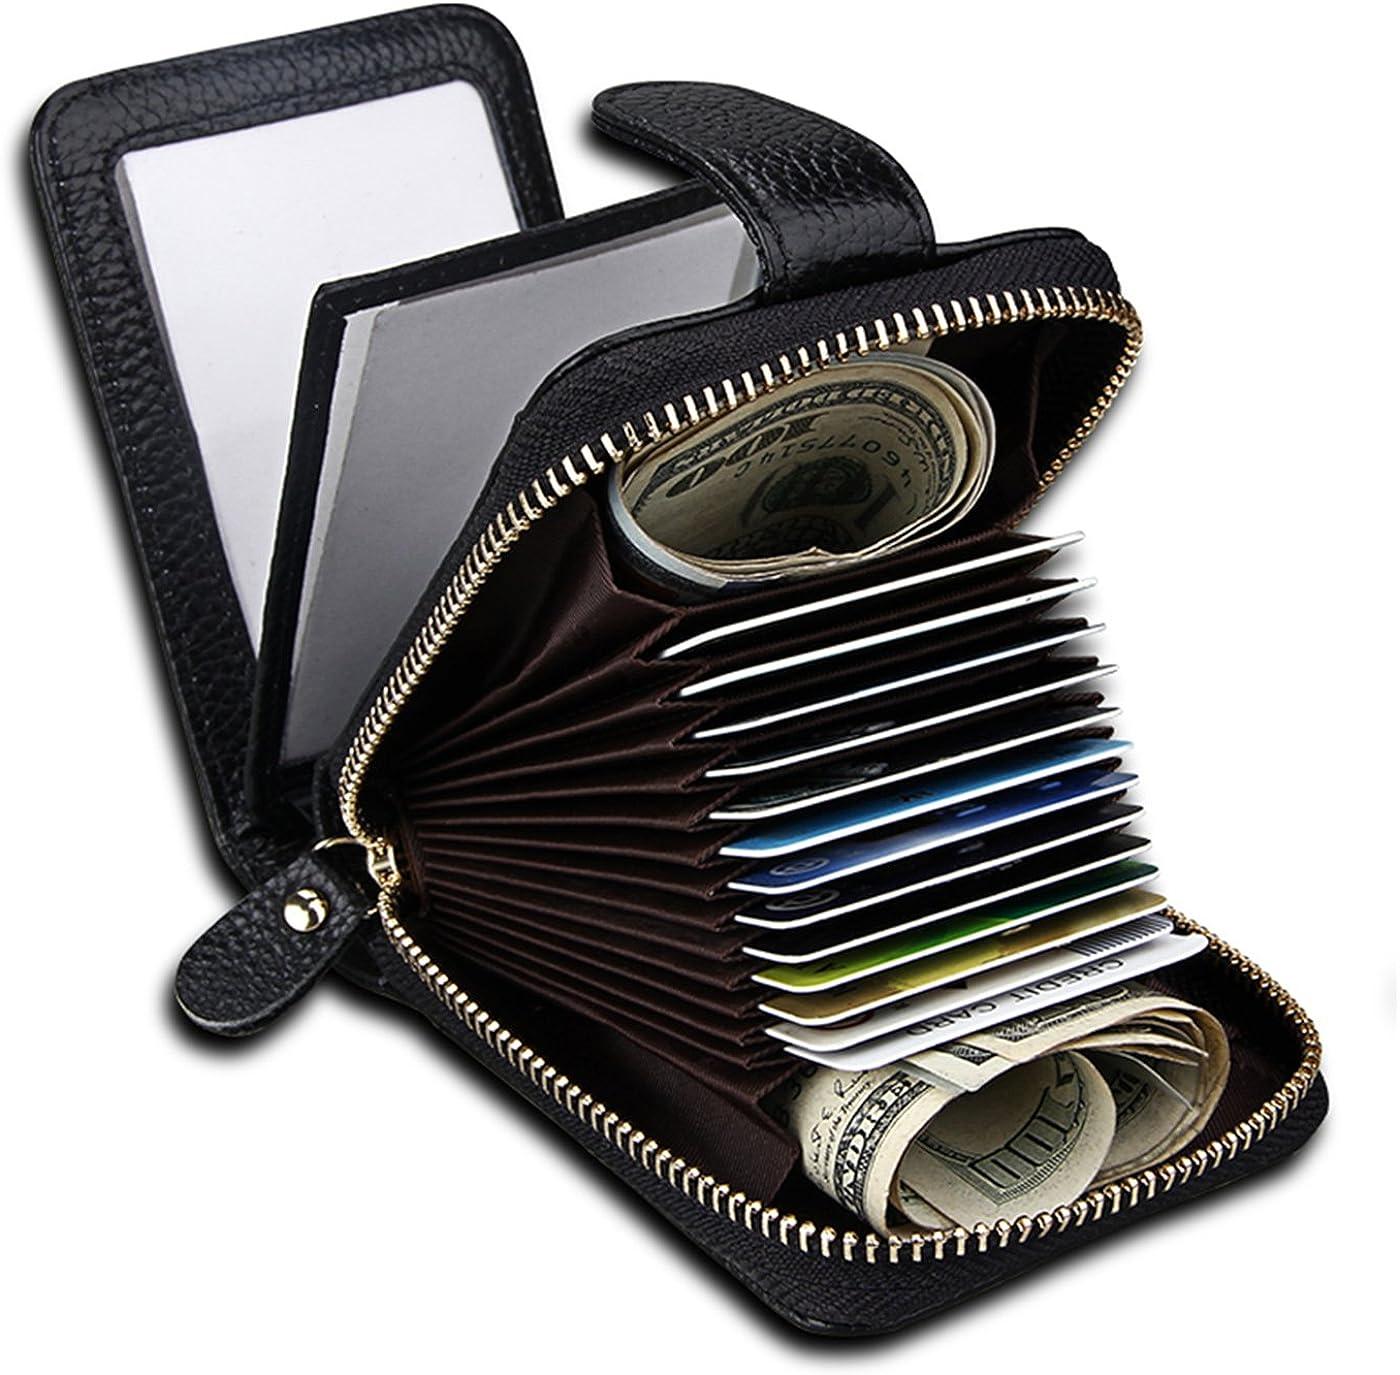 Women's Credit Card Holder...